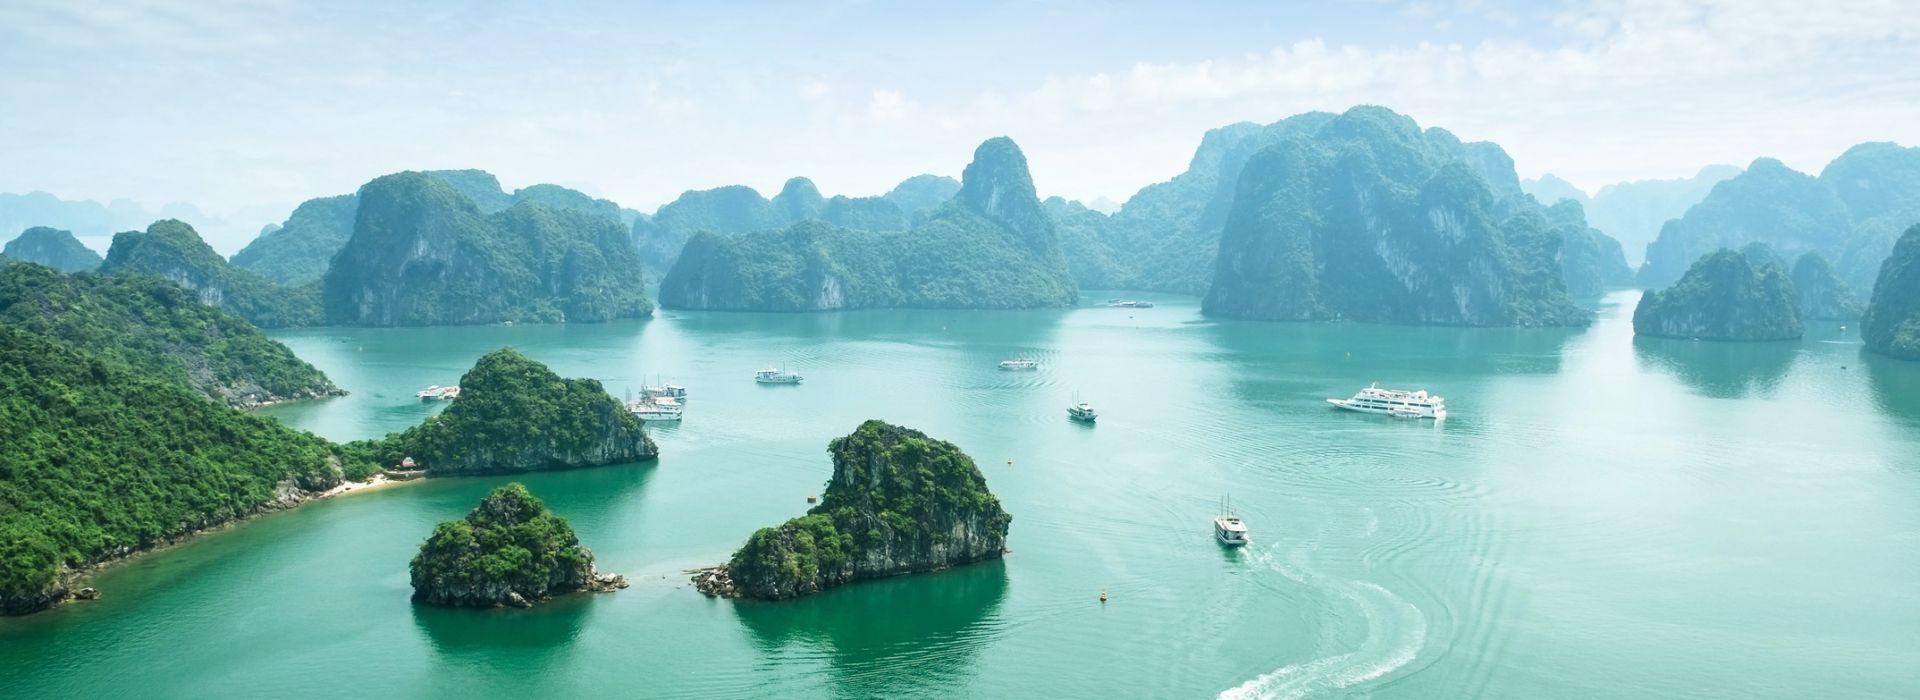 Standup paddleboarding Tours in Vietnam